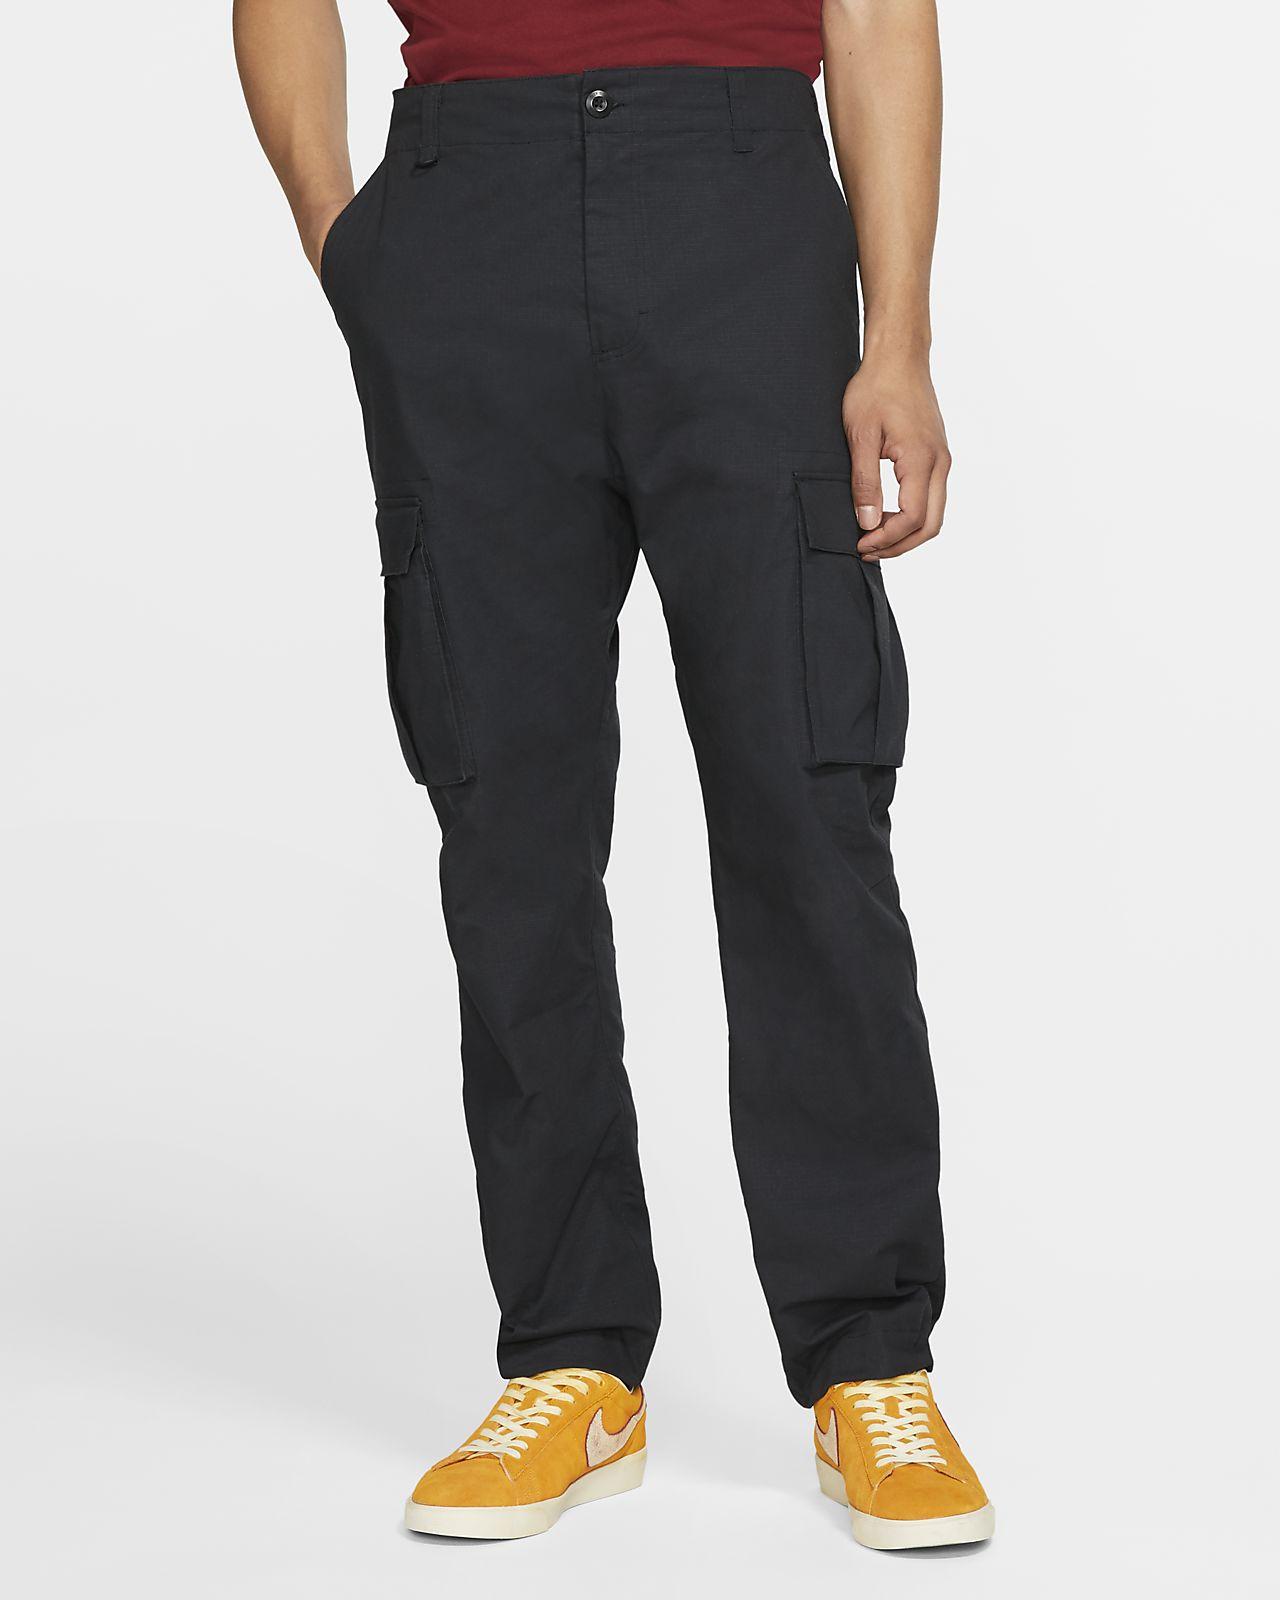 Pantalon de skateboard Nike SB Flex FTM pour Homme